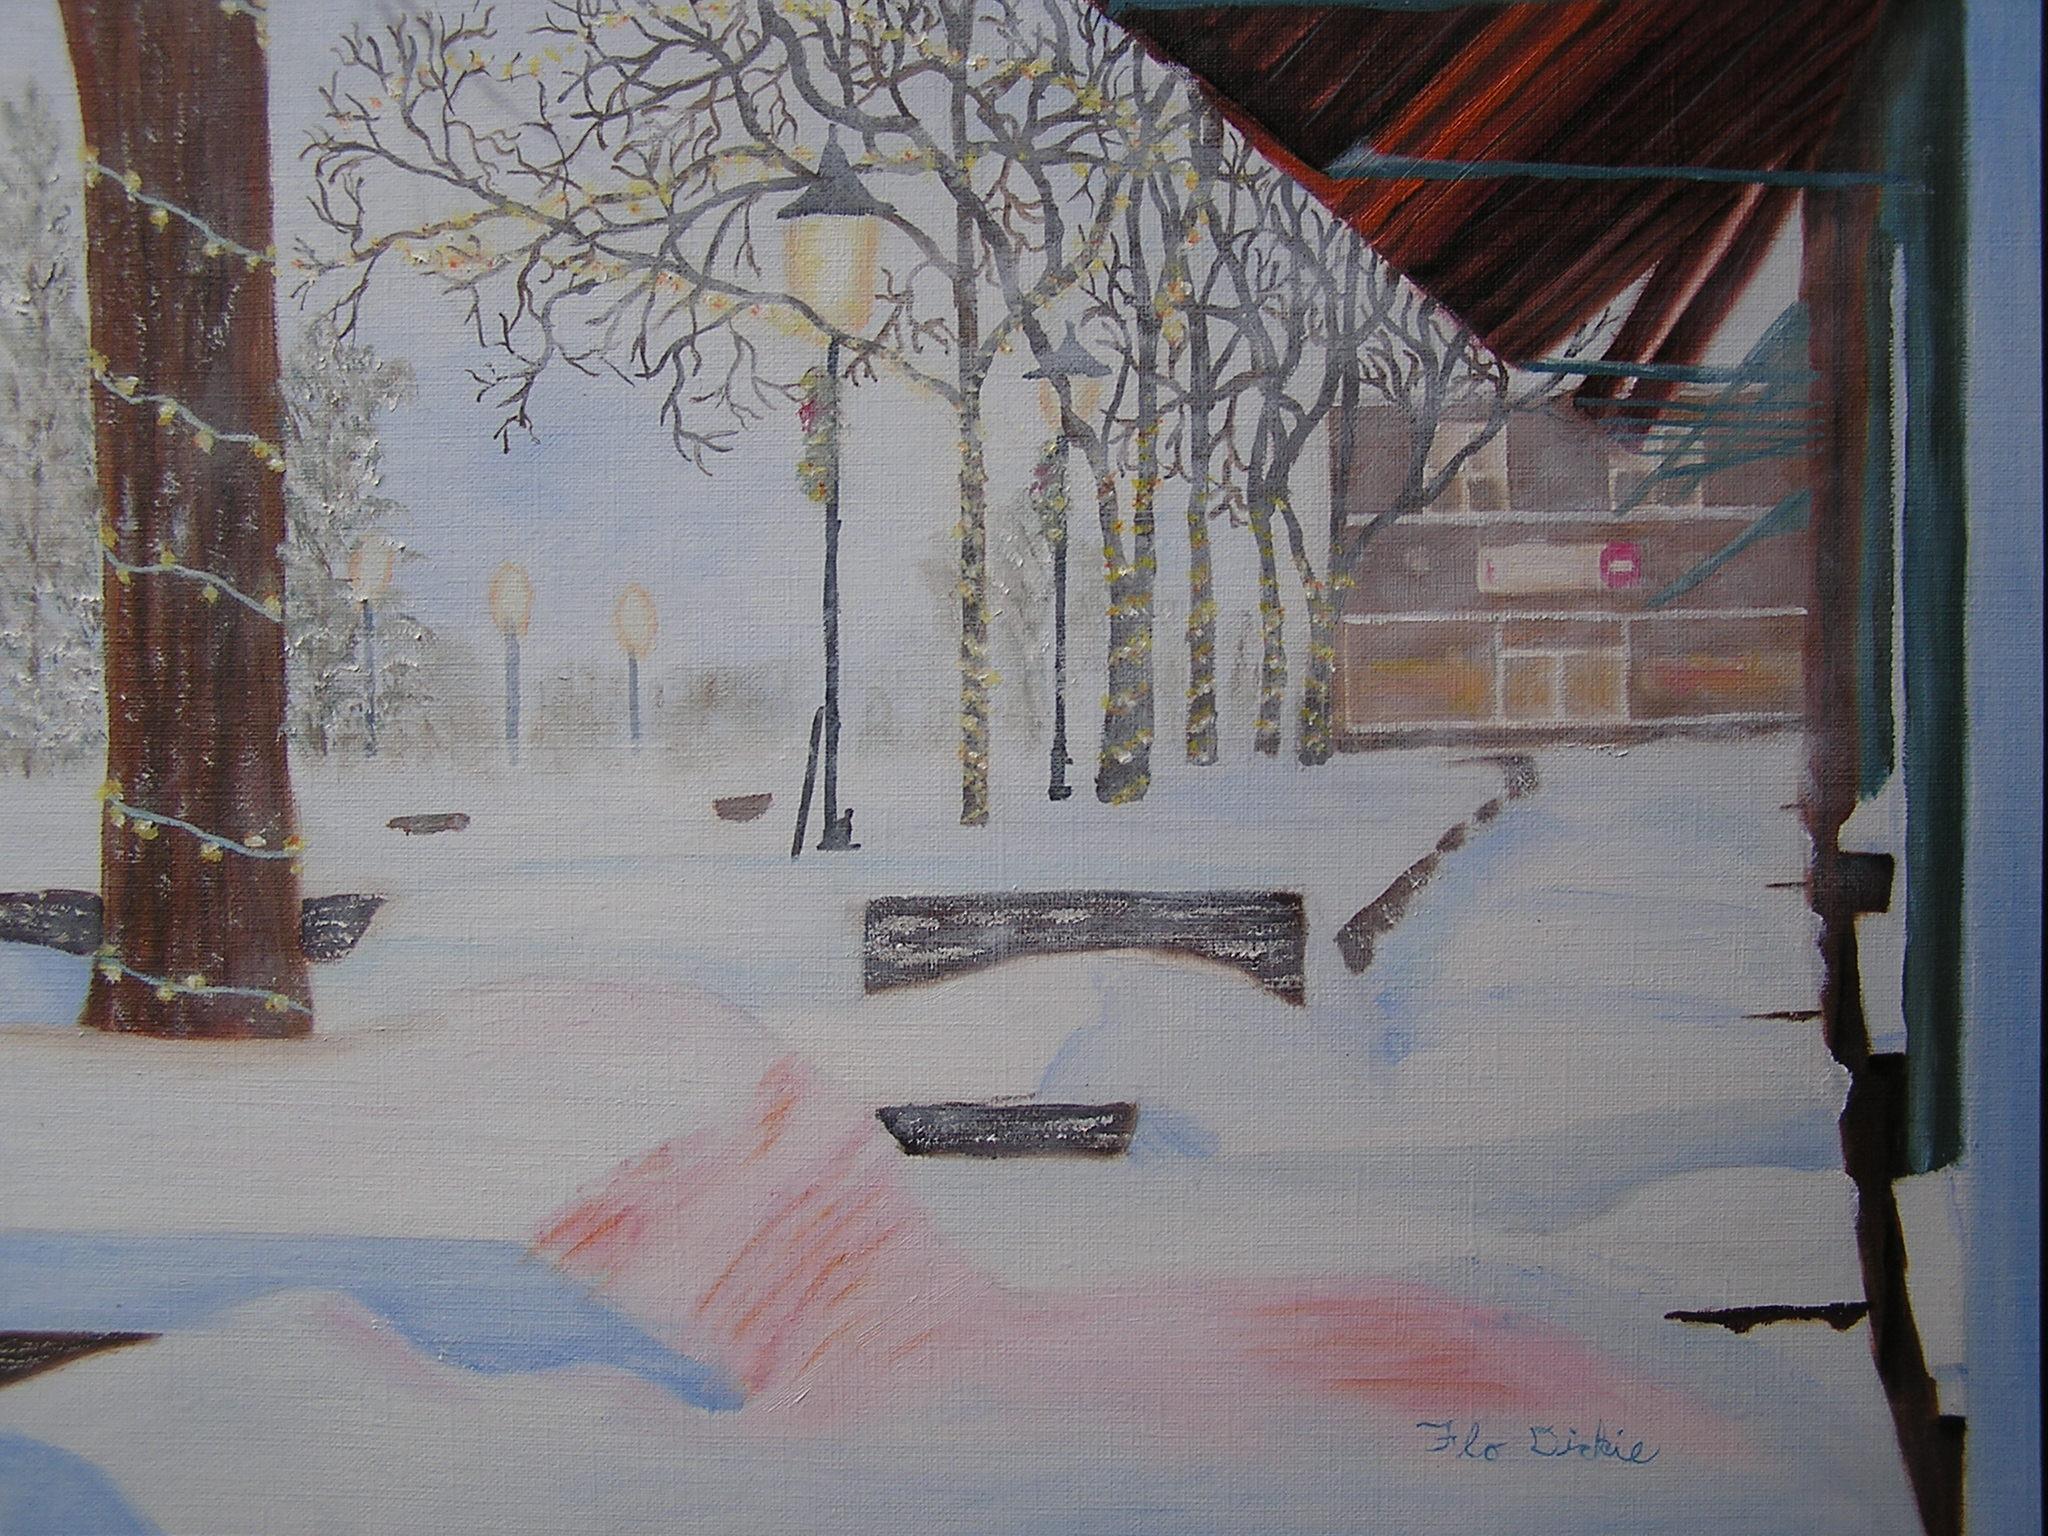 Snowstorm - Flo Dickie